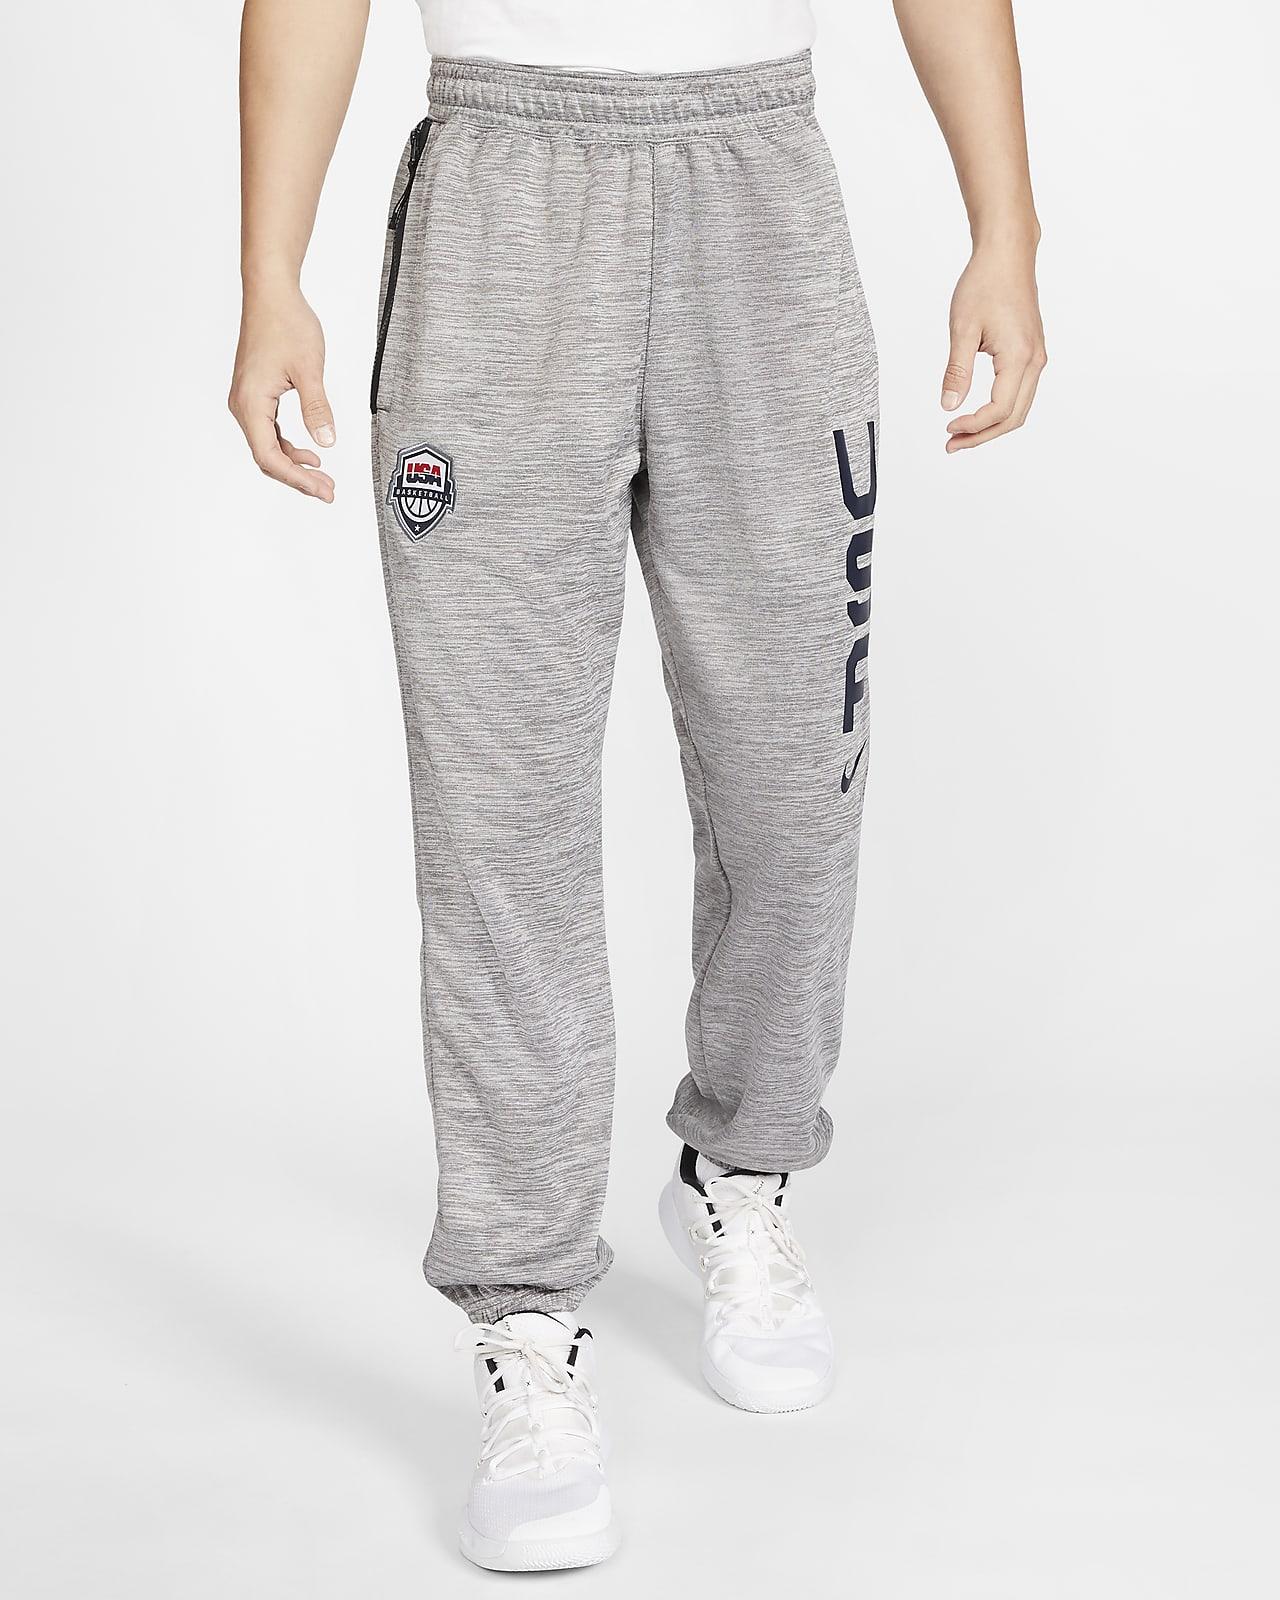 Team USA Spotlight Men's Basketball Pants